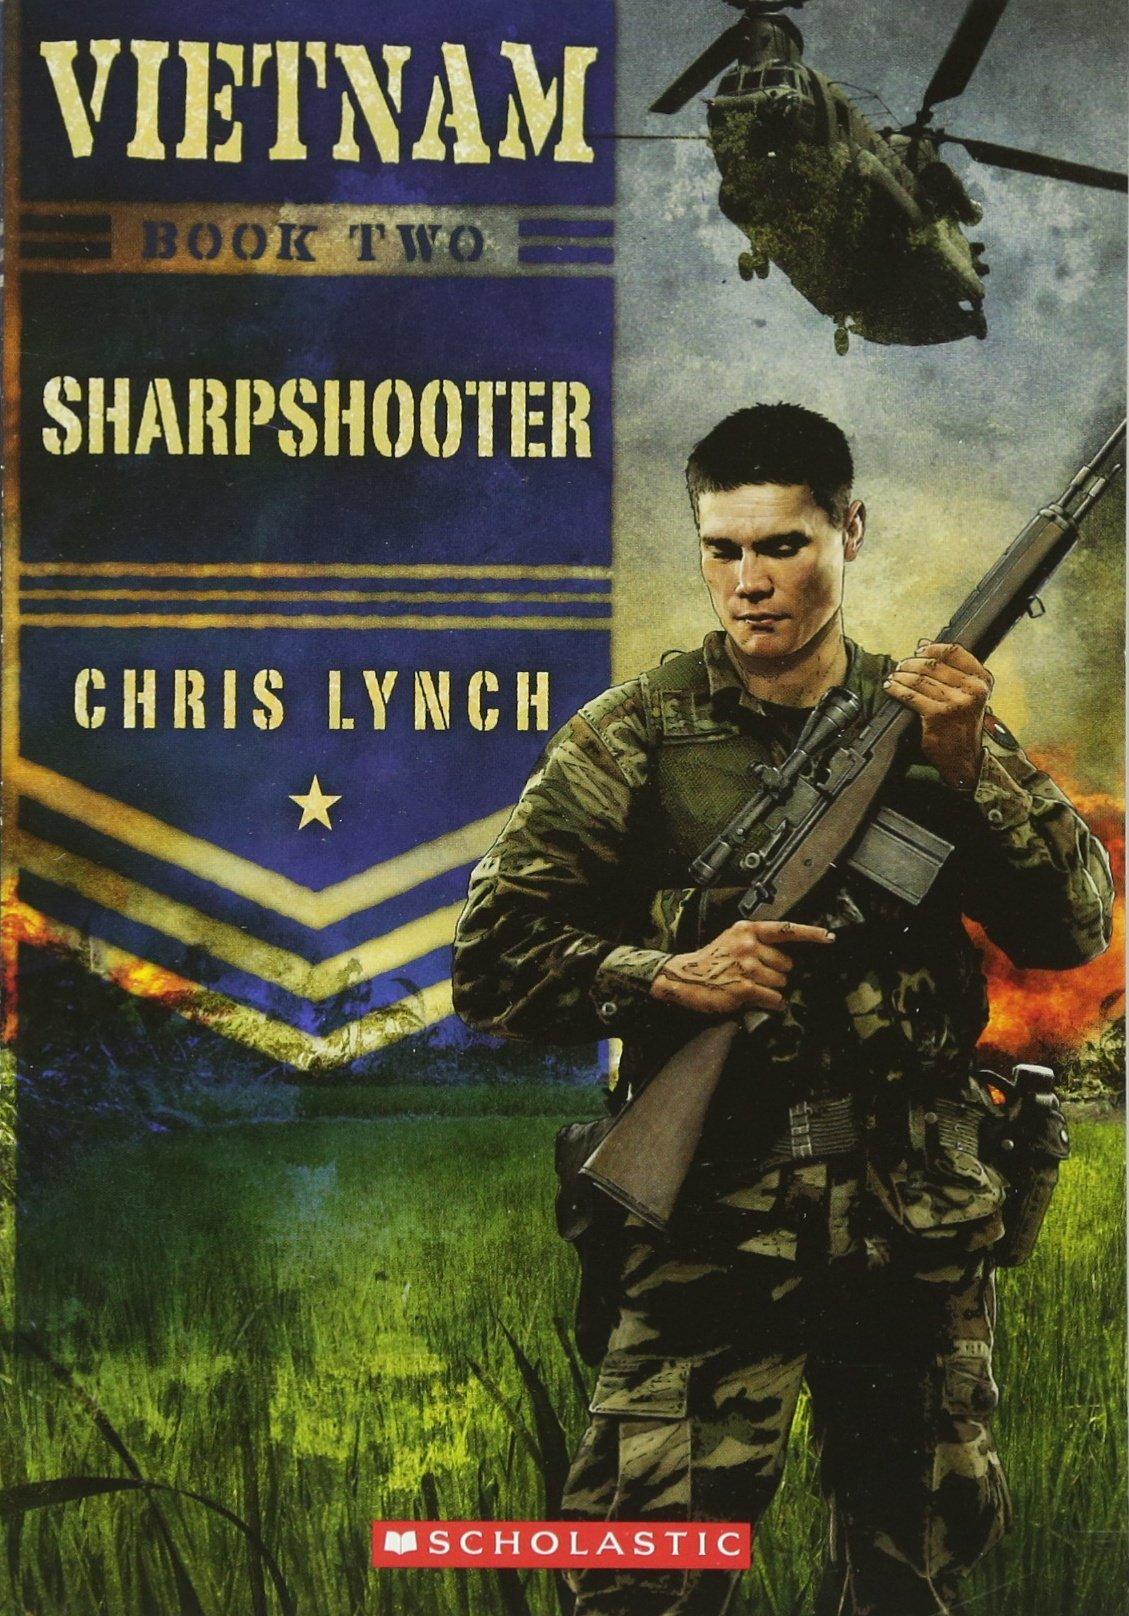 Read Online Vietnam #2: Sharpshooter PDF